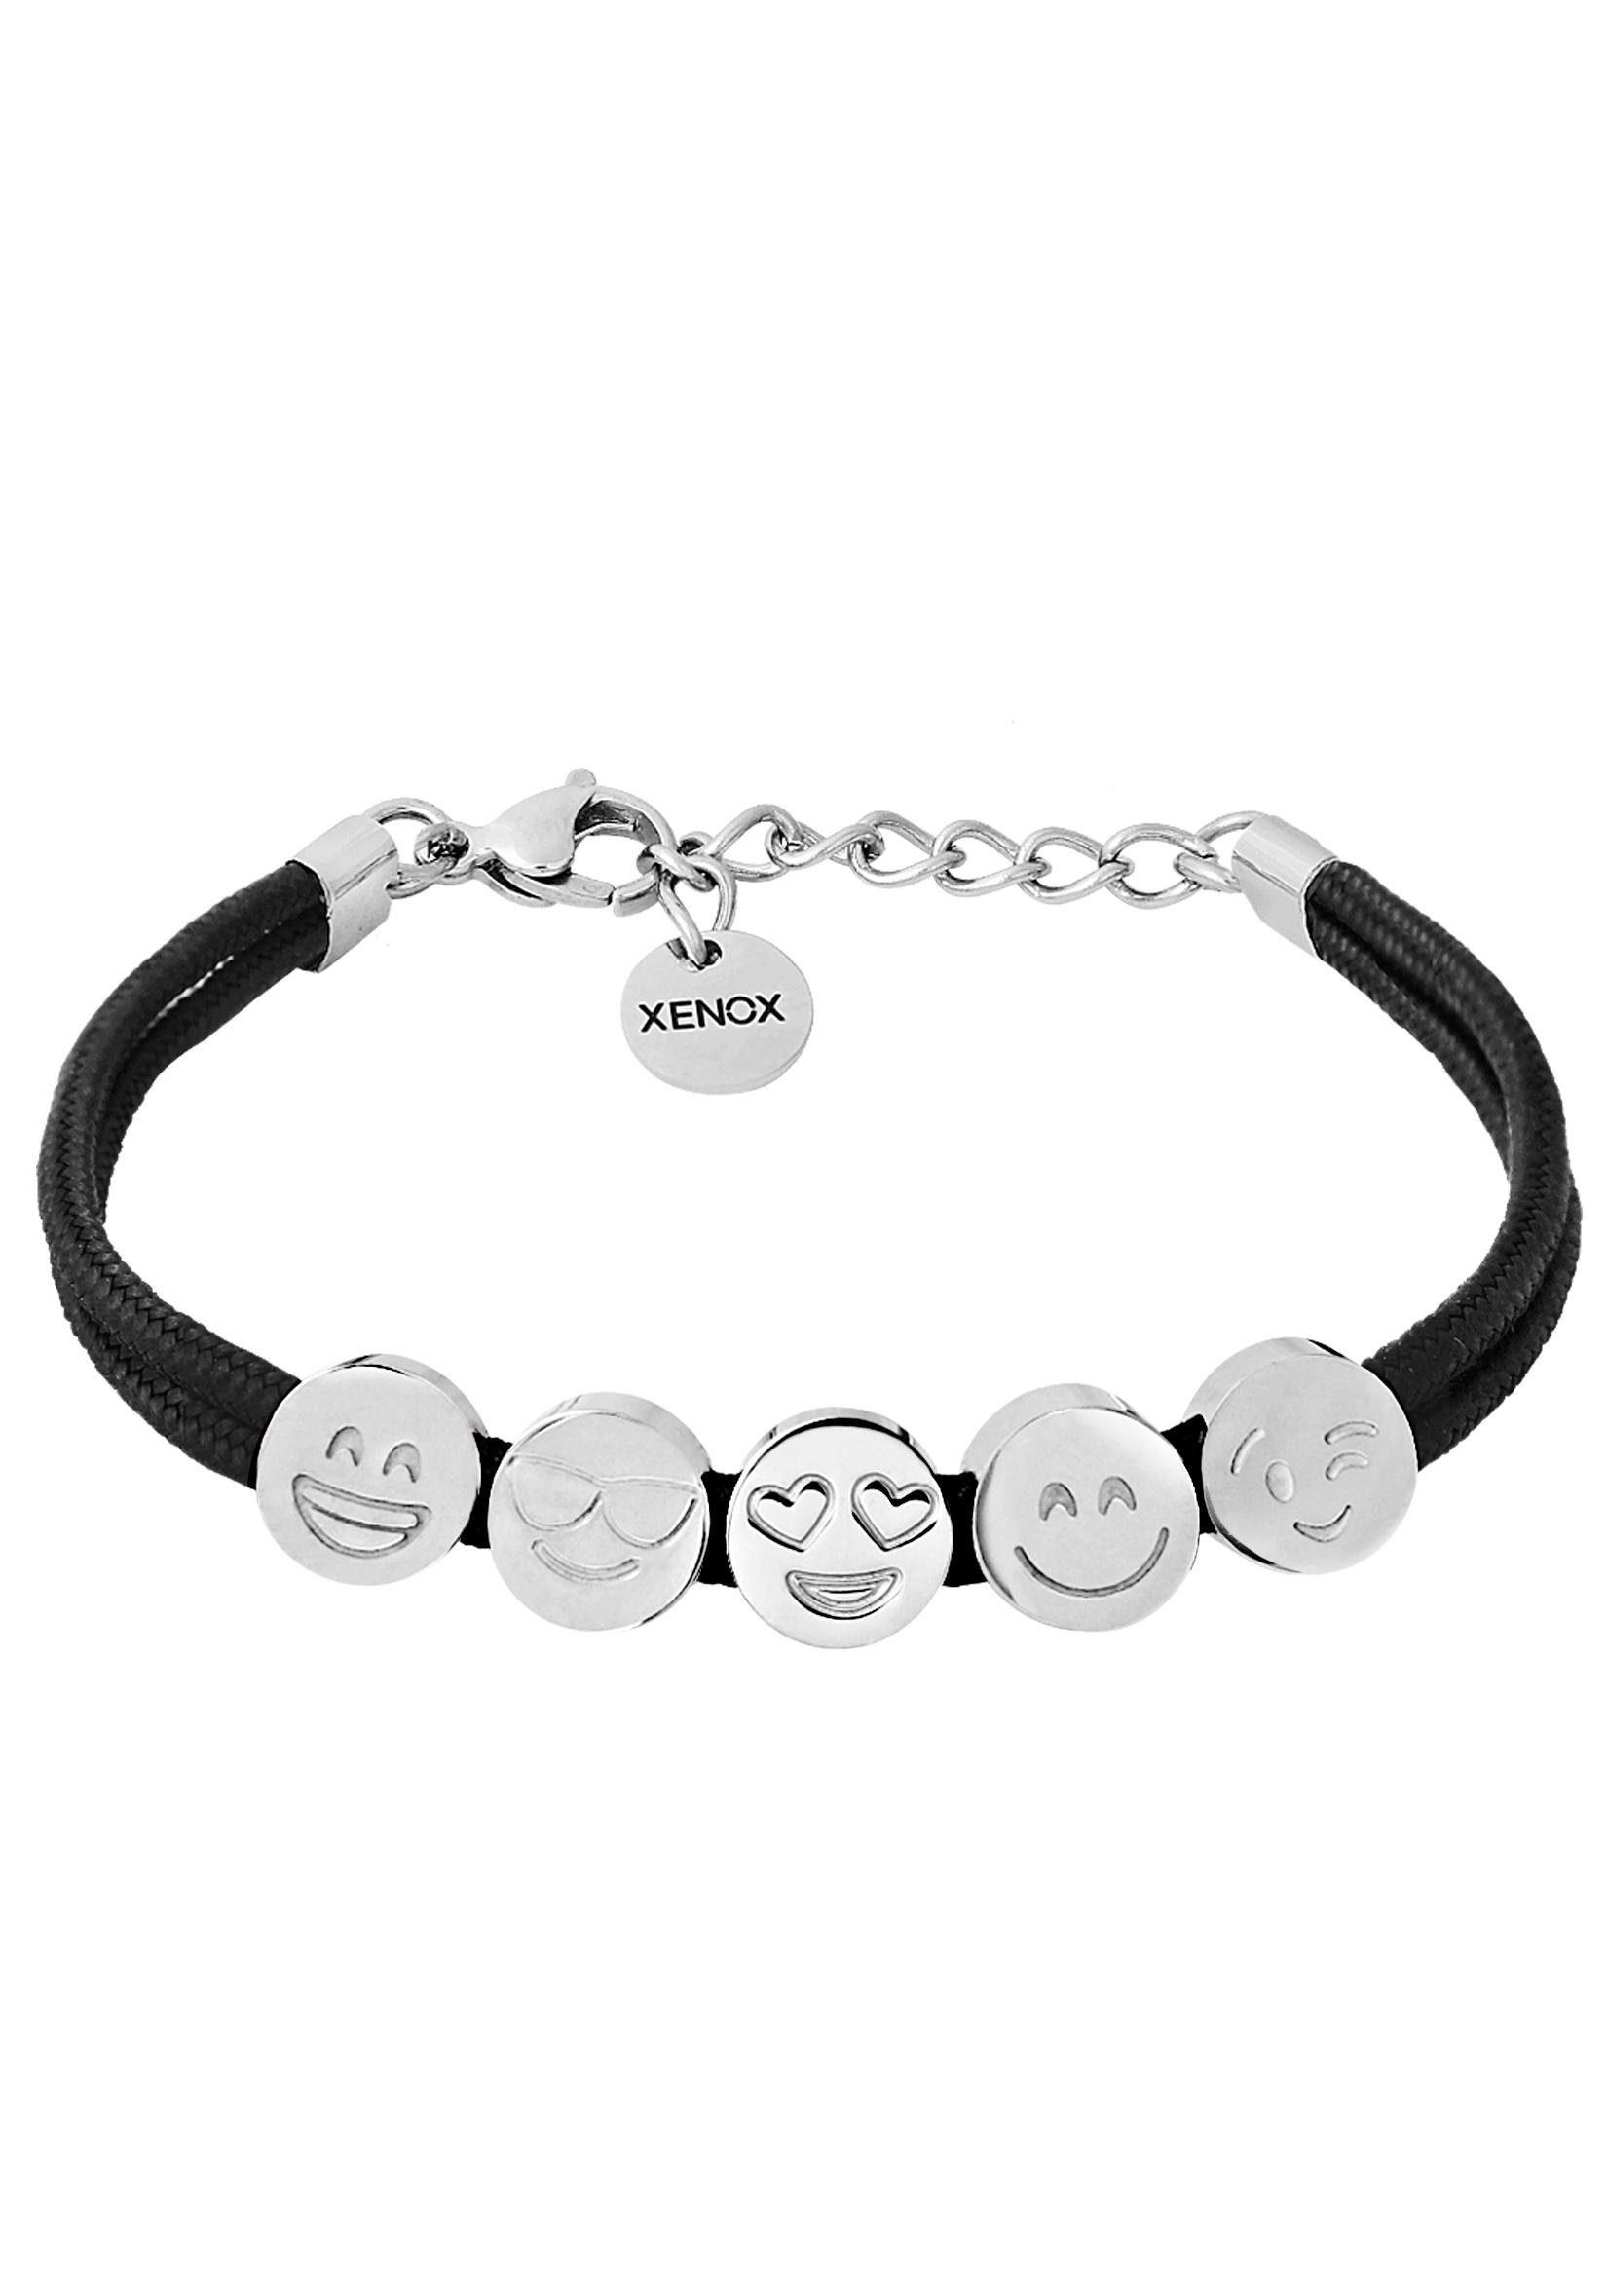 XENOX Armband »Emojis, Symbolic Power, X2750«